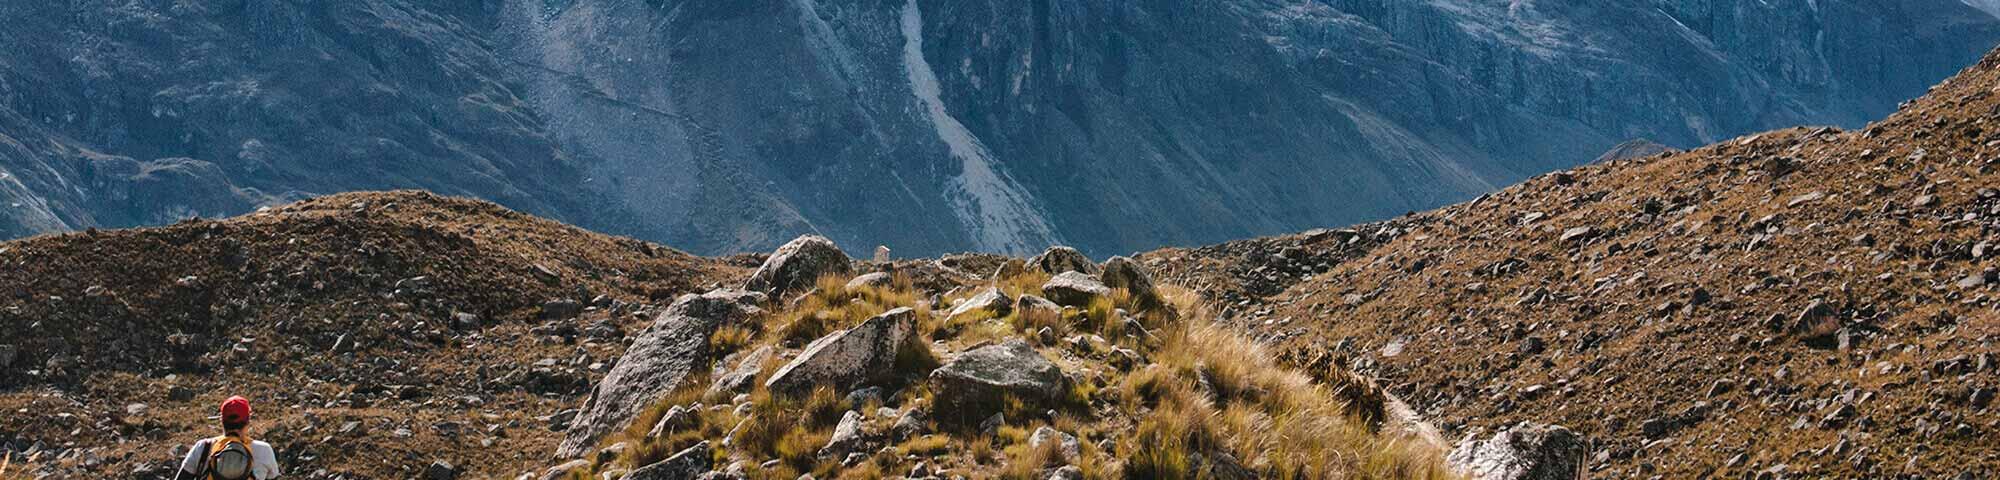 Nevado Huascarán (6768 m.s.n.m.)